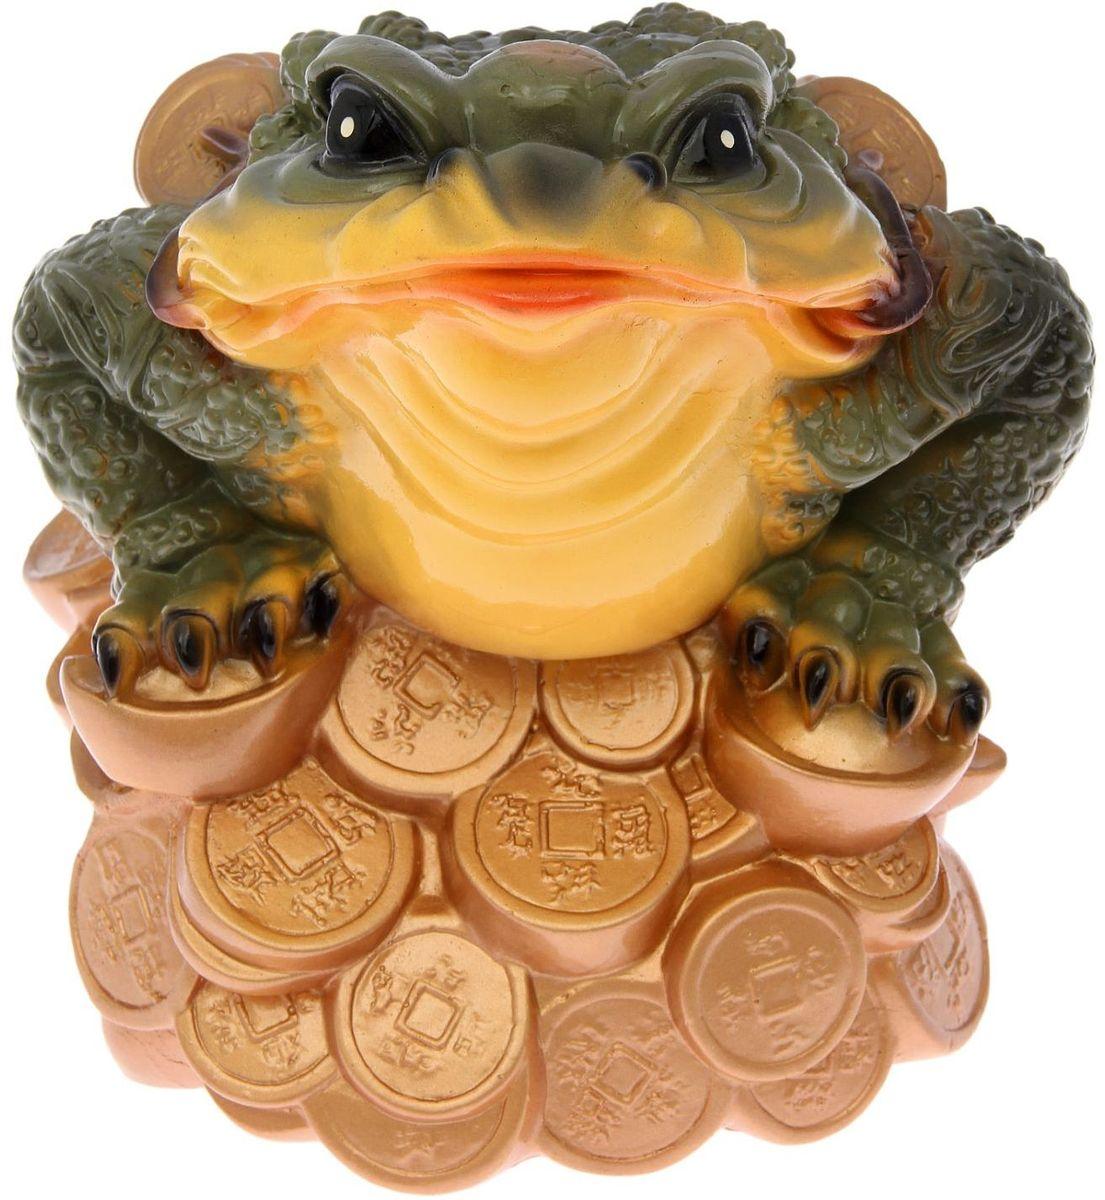 Фигура садовая Лягушка на монетах, 34 х 23 х 25 см садовая техника кайман